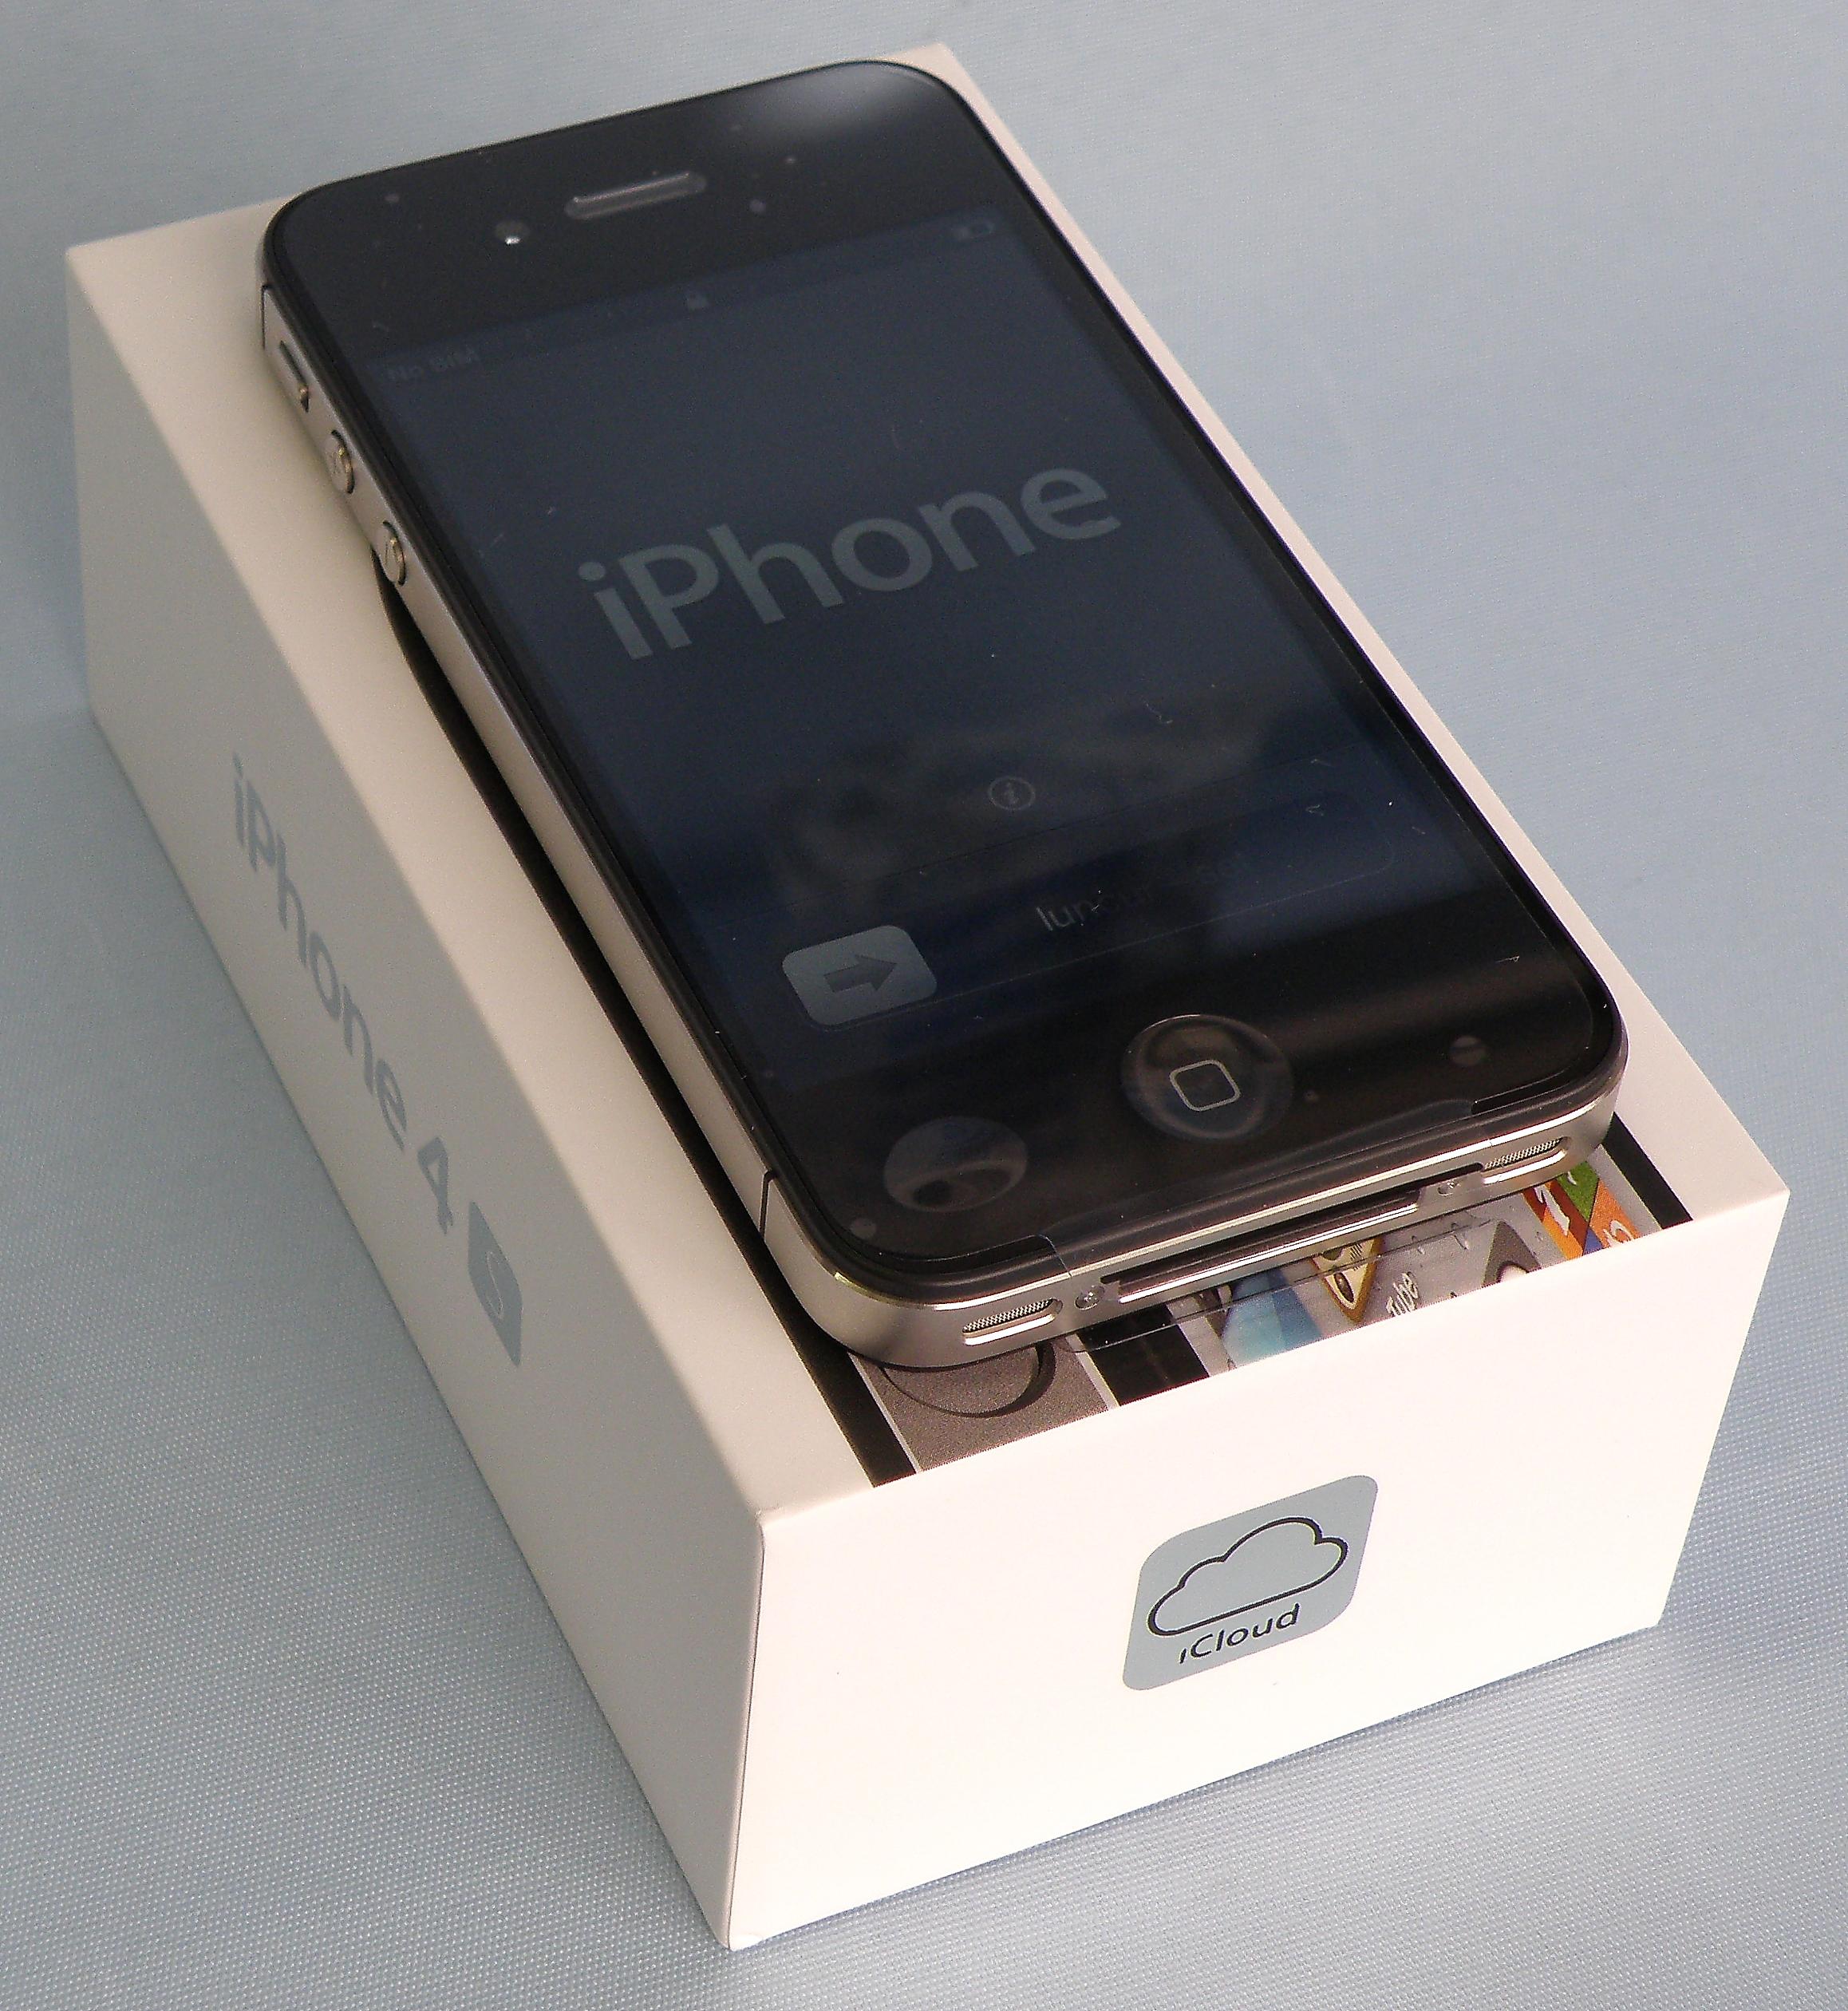 au Apple iPhone4S 32GB MD243J/A